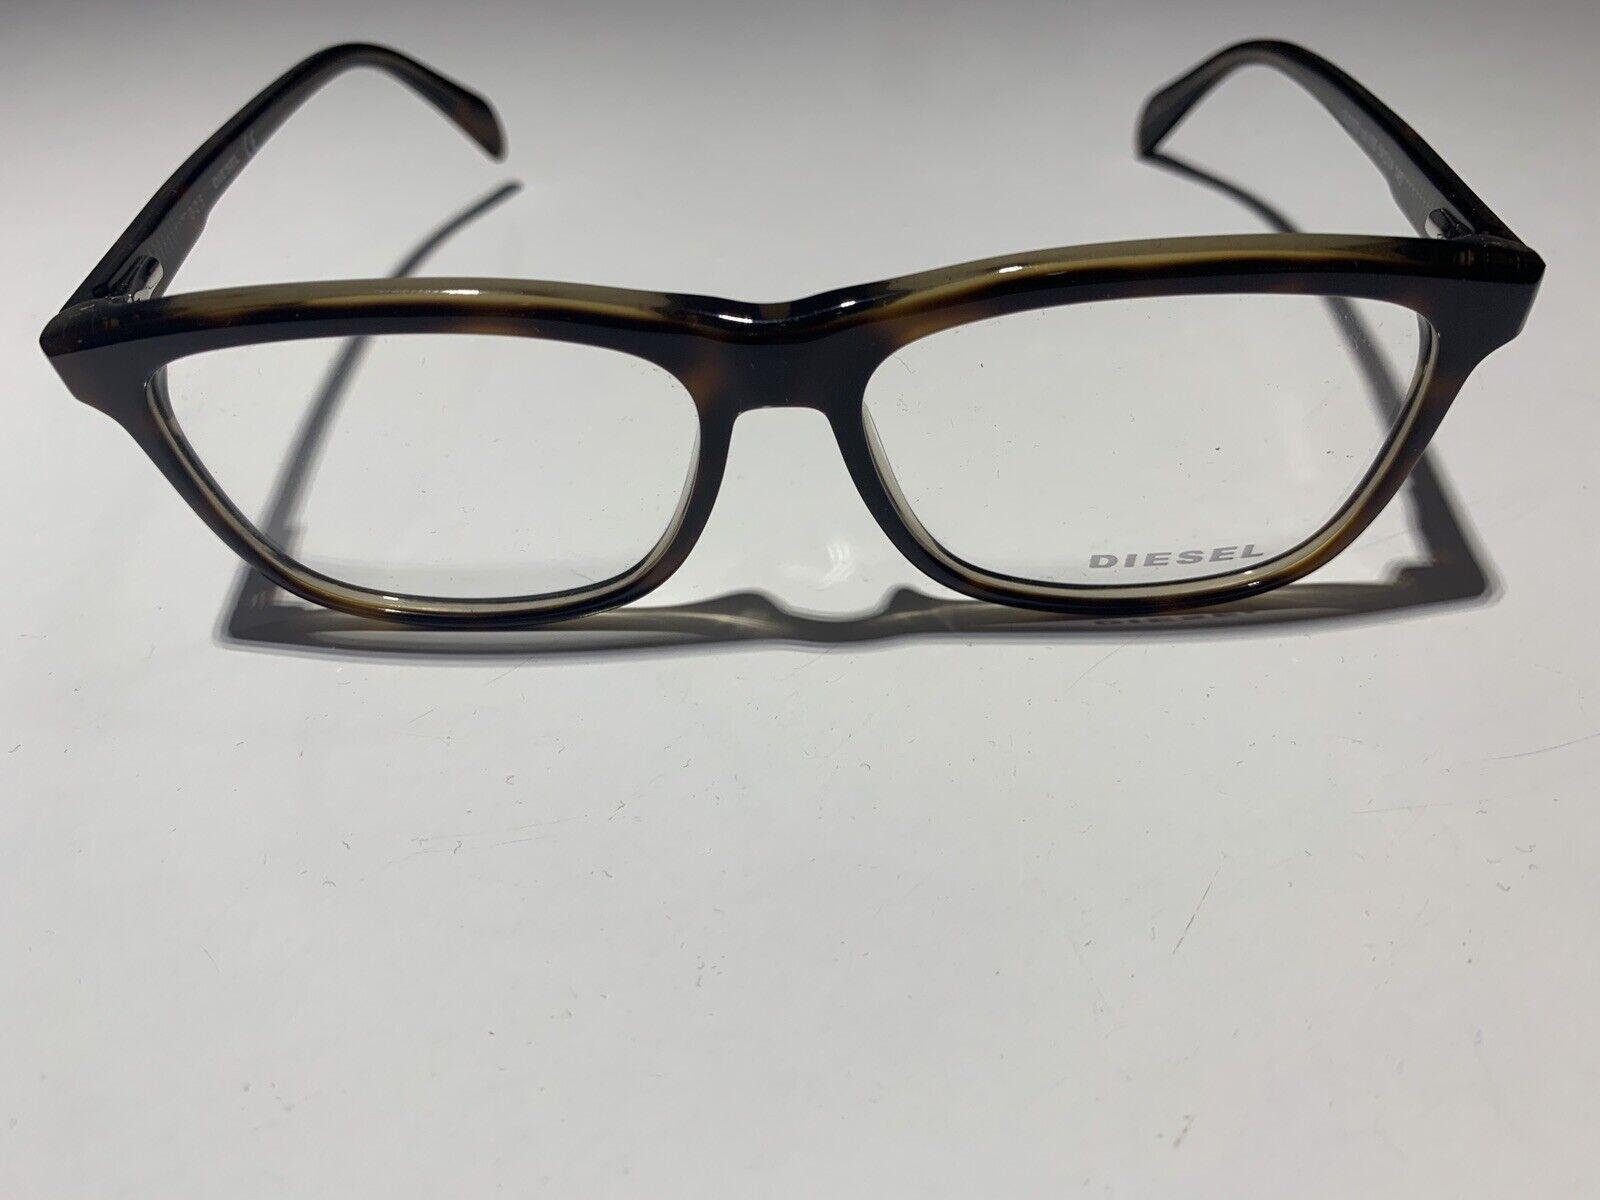 Diesel Rx Eyeglasses Frames DL5137 020 55-14-140 Black Grey Denim on Shiny Black